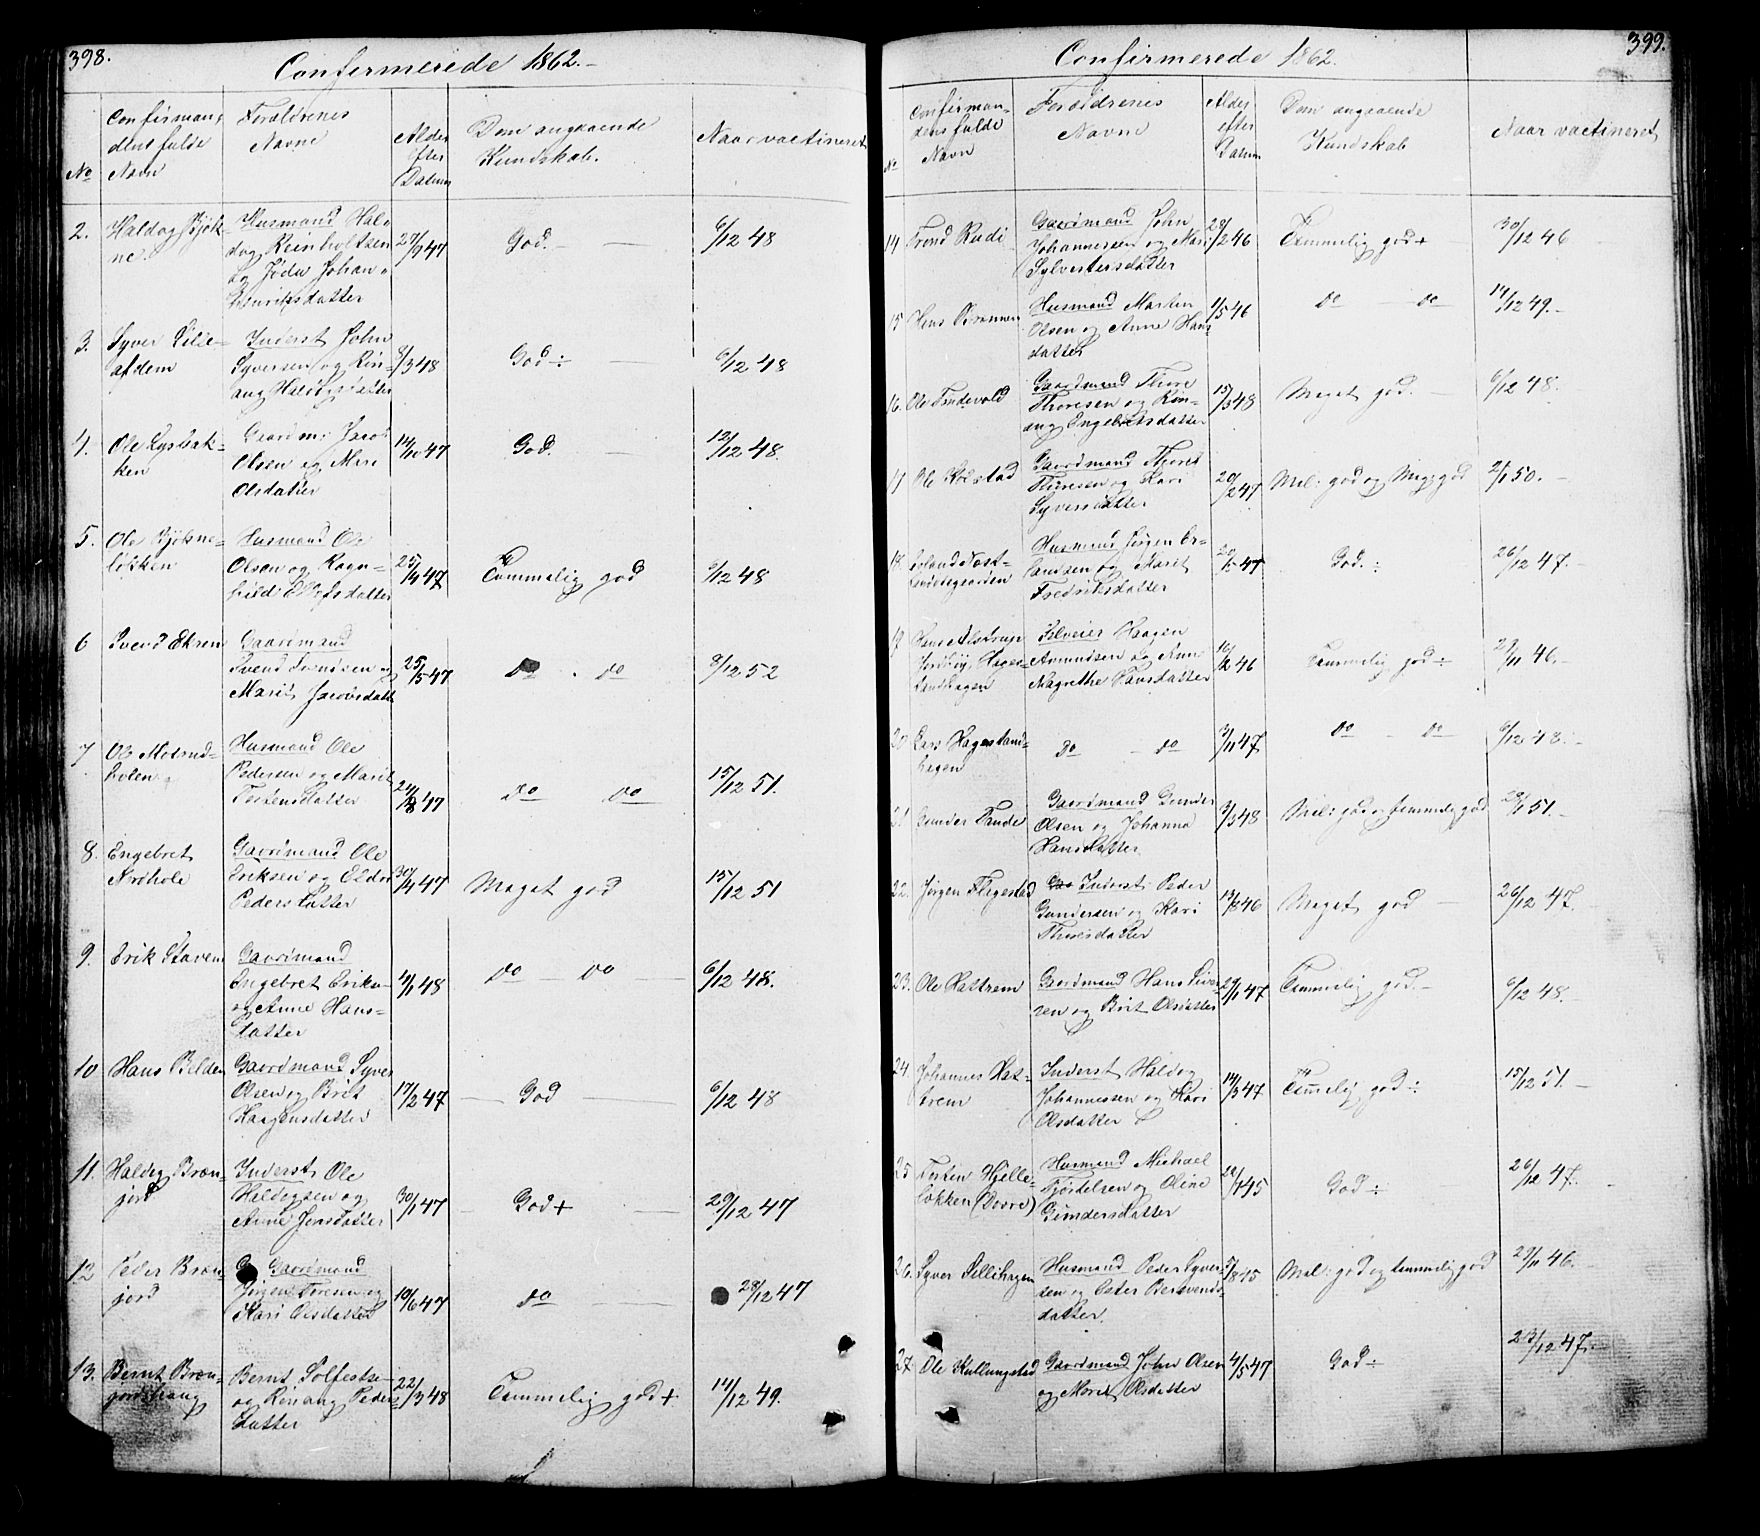 SAH, Lesja prestekontor, Klokkerbok nr. 5, 1850-1894, s. 398-399